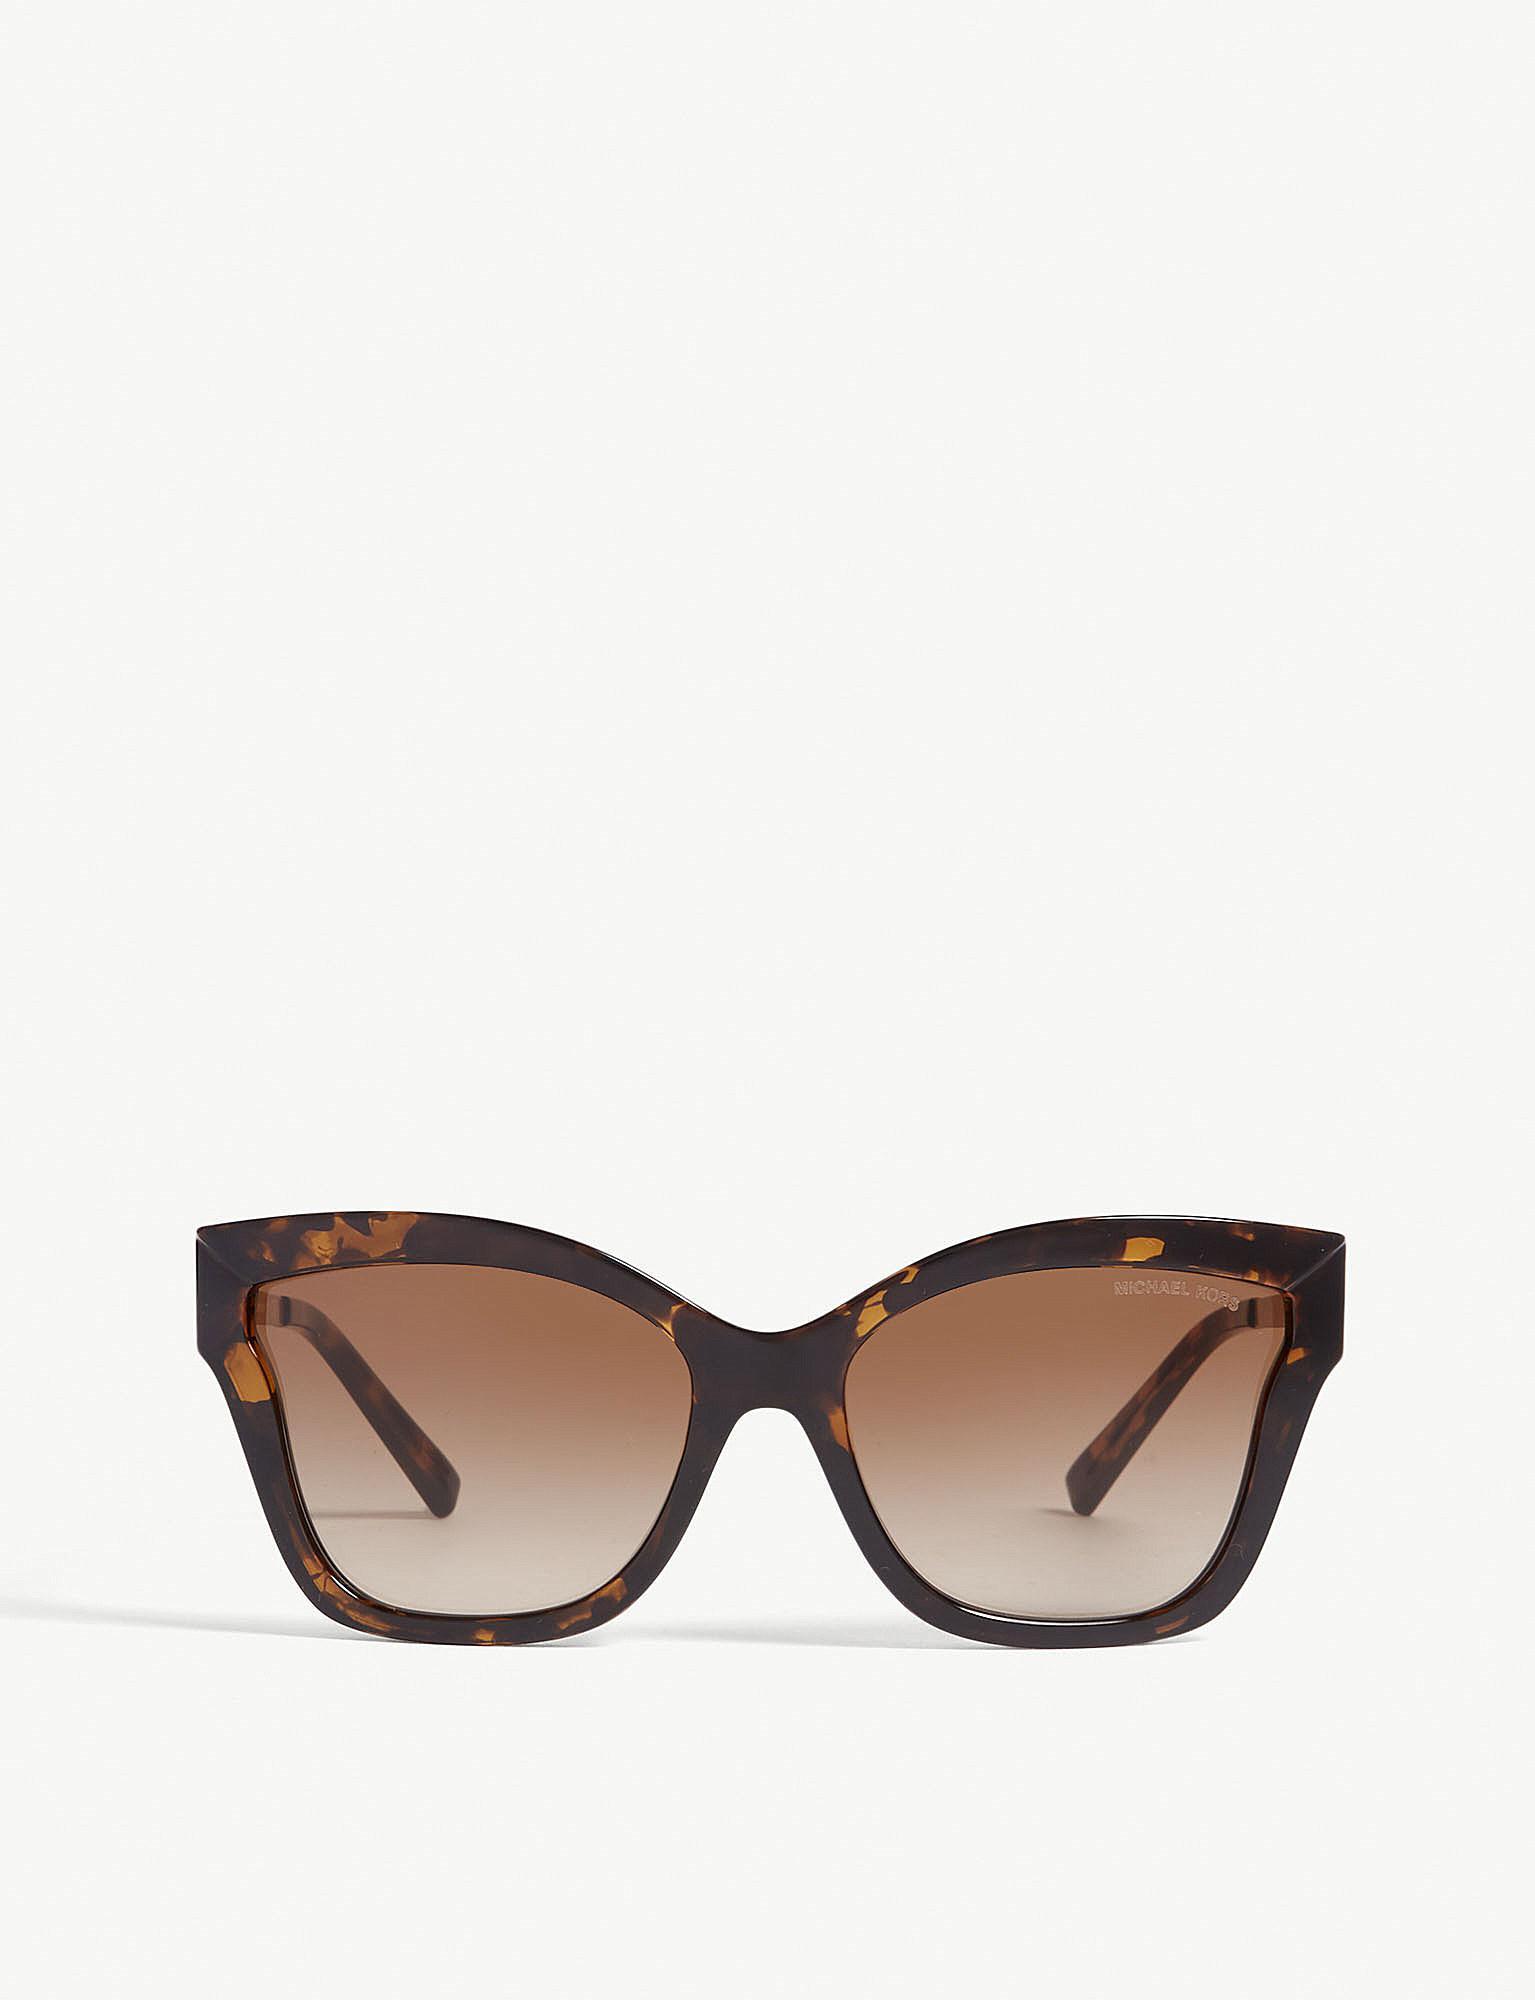 0713716302 Michael Kors Mk2072 Barbados Cat-eye Frame Sunglasses in Brown - Lyst